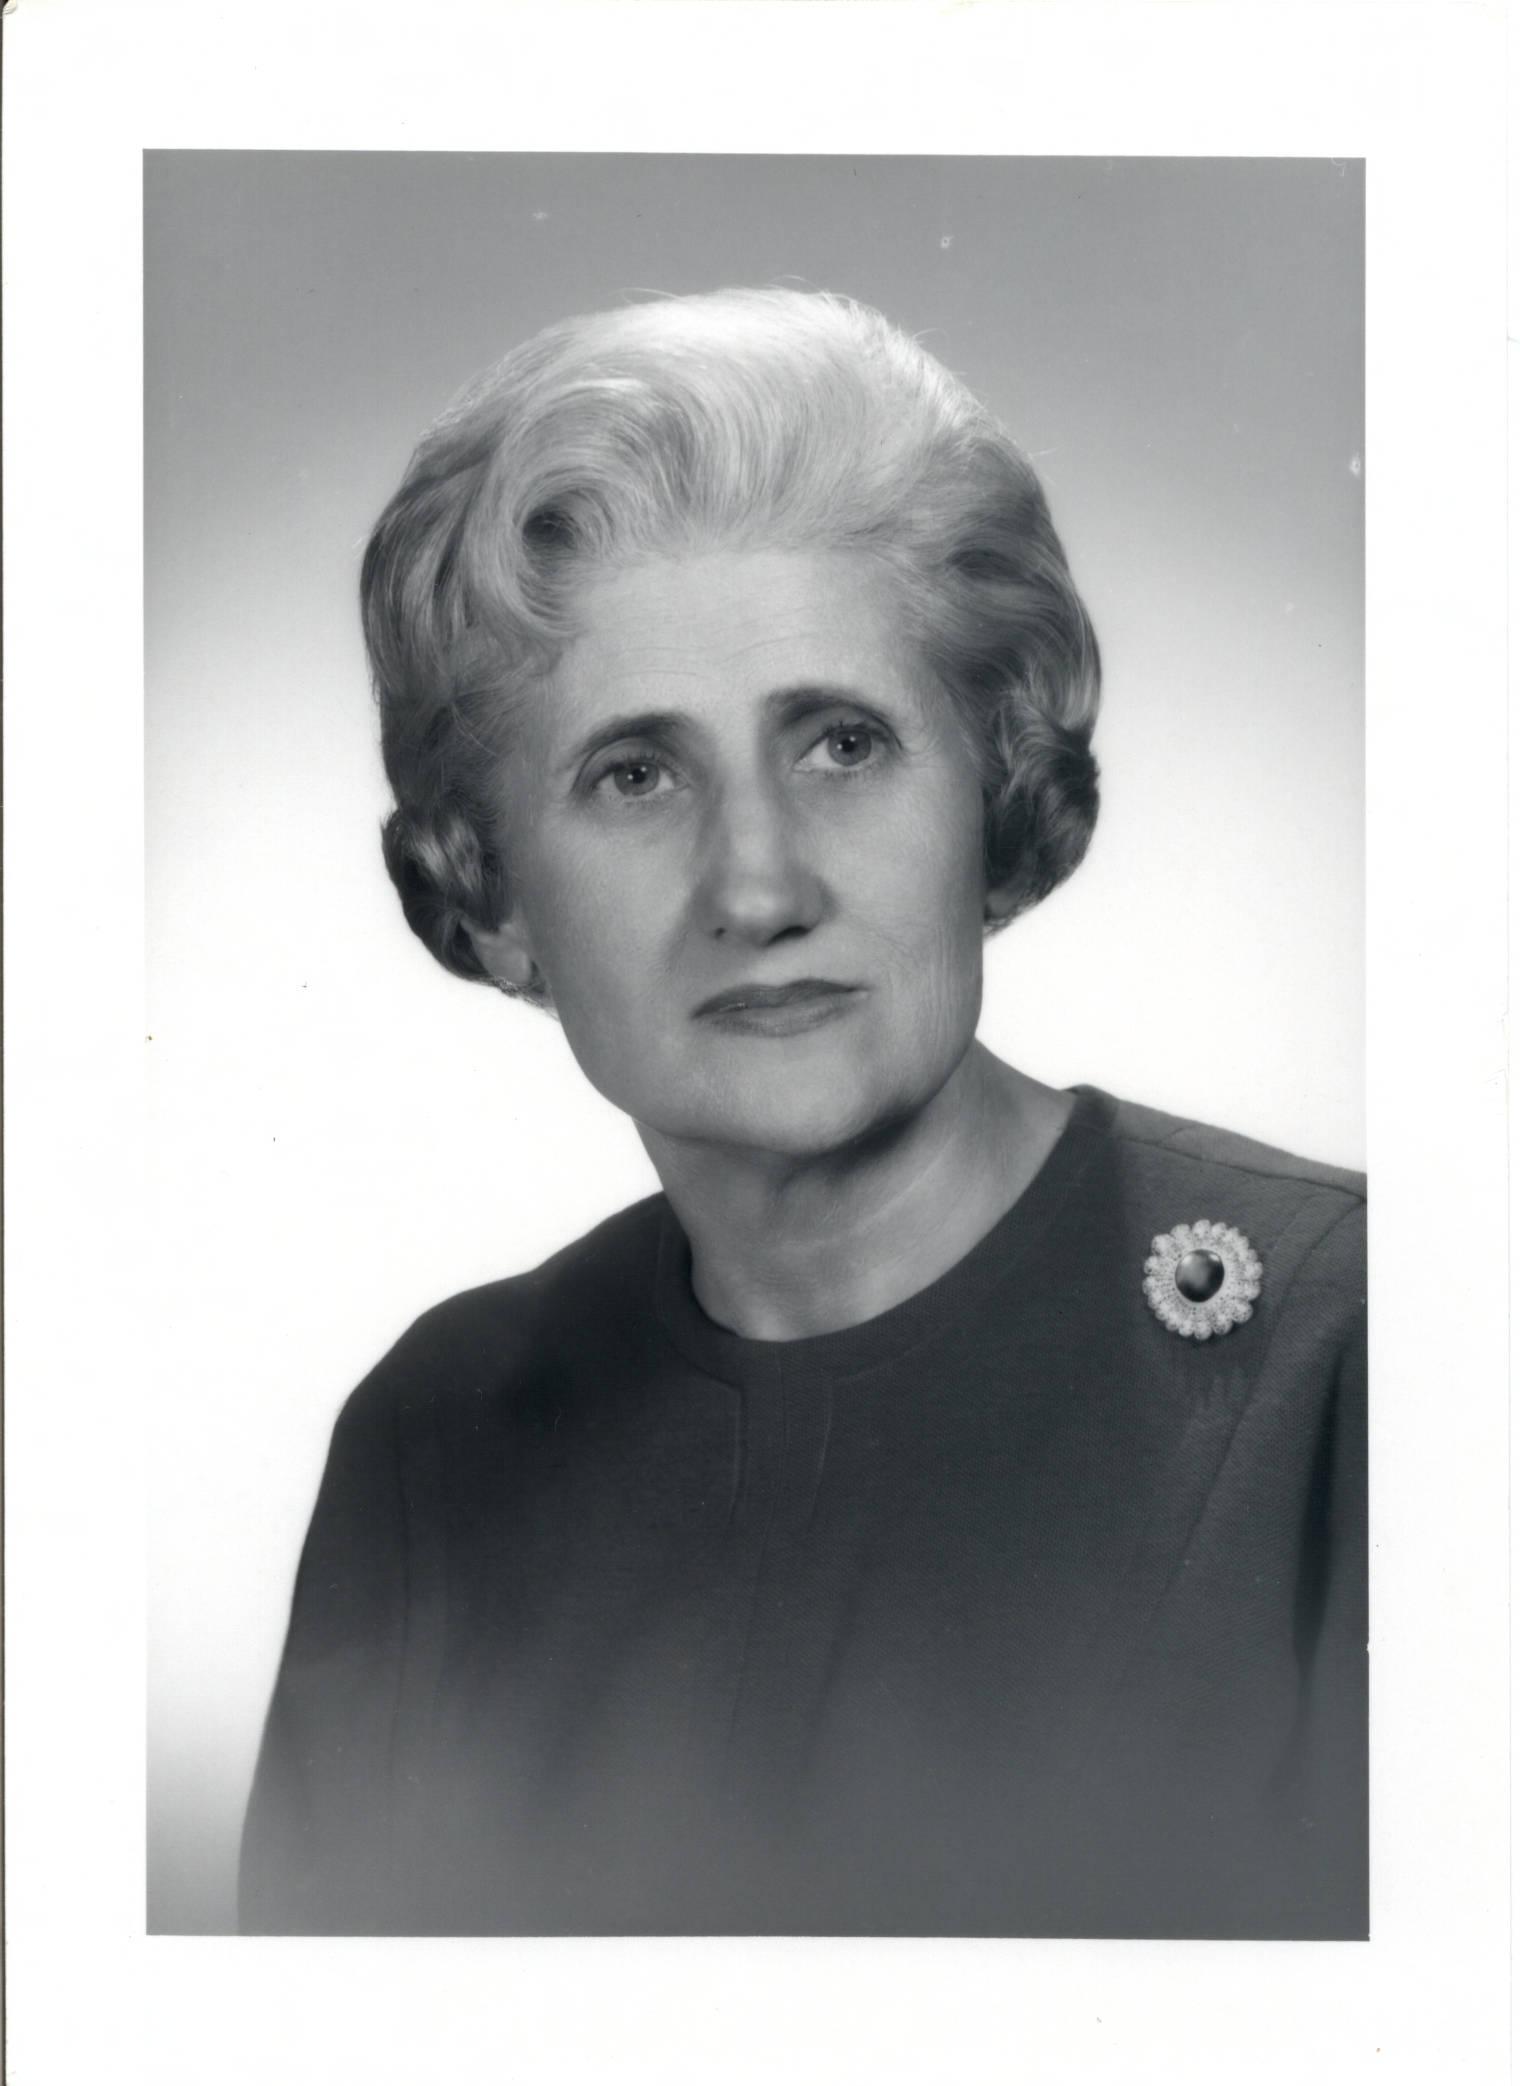 Katherine Kennedy Carmichael (1912-1982). From https://museum.unc.edu/exhibits/show/names/item/1160